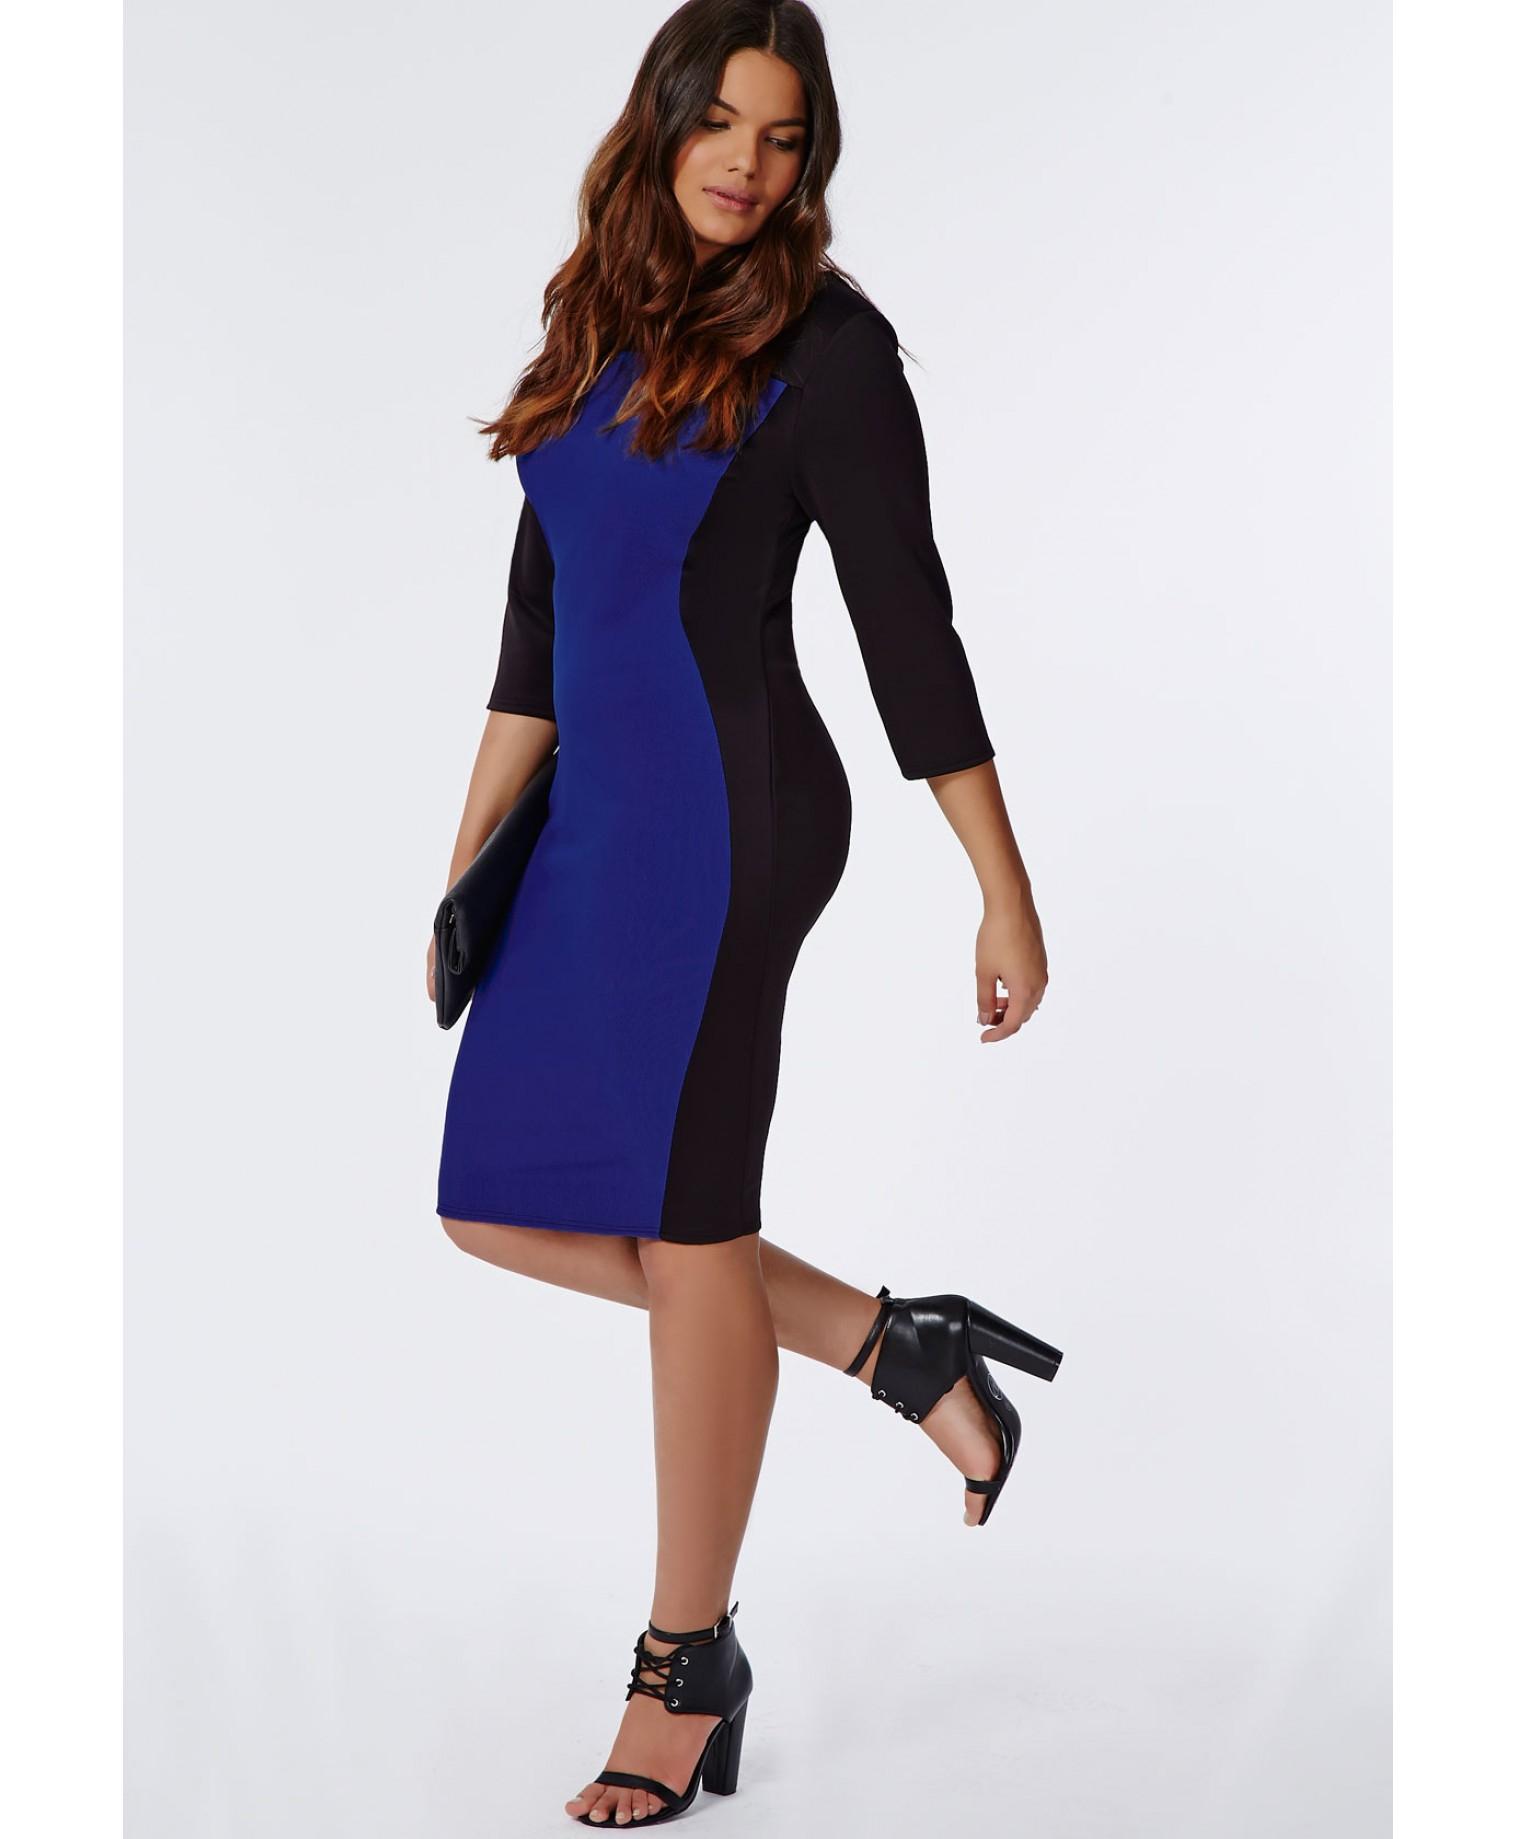 plus size illusion dress - gaussianblur